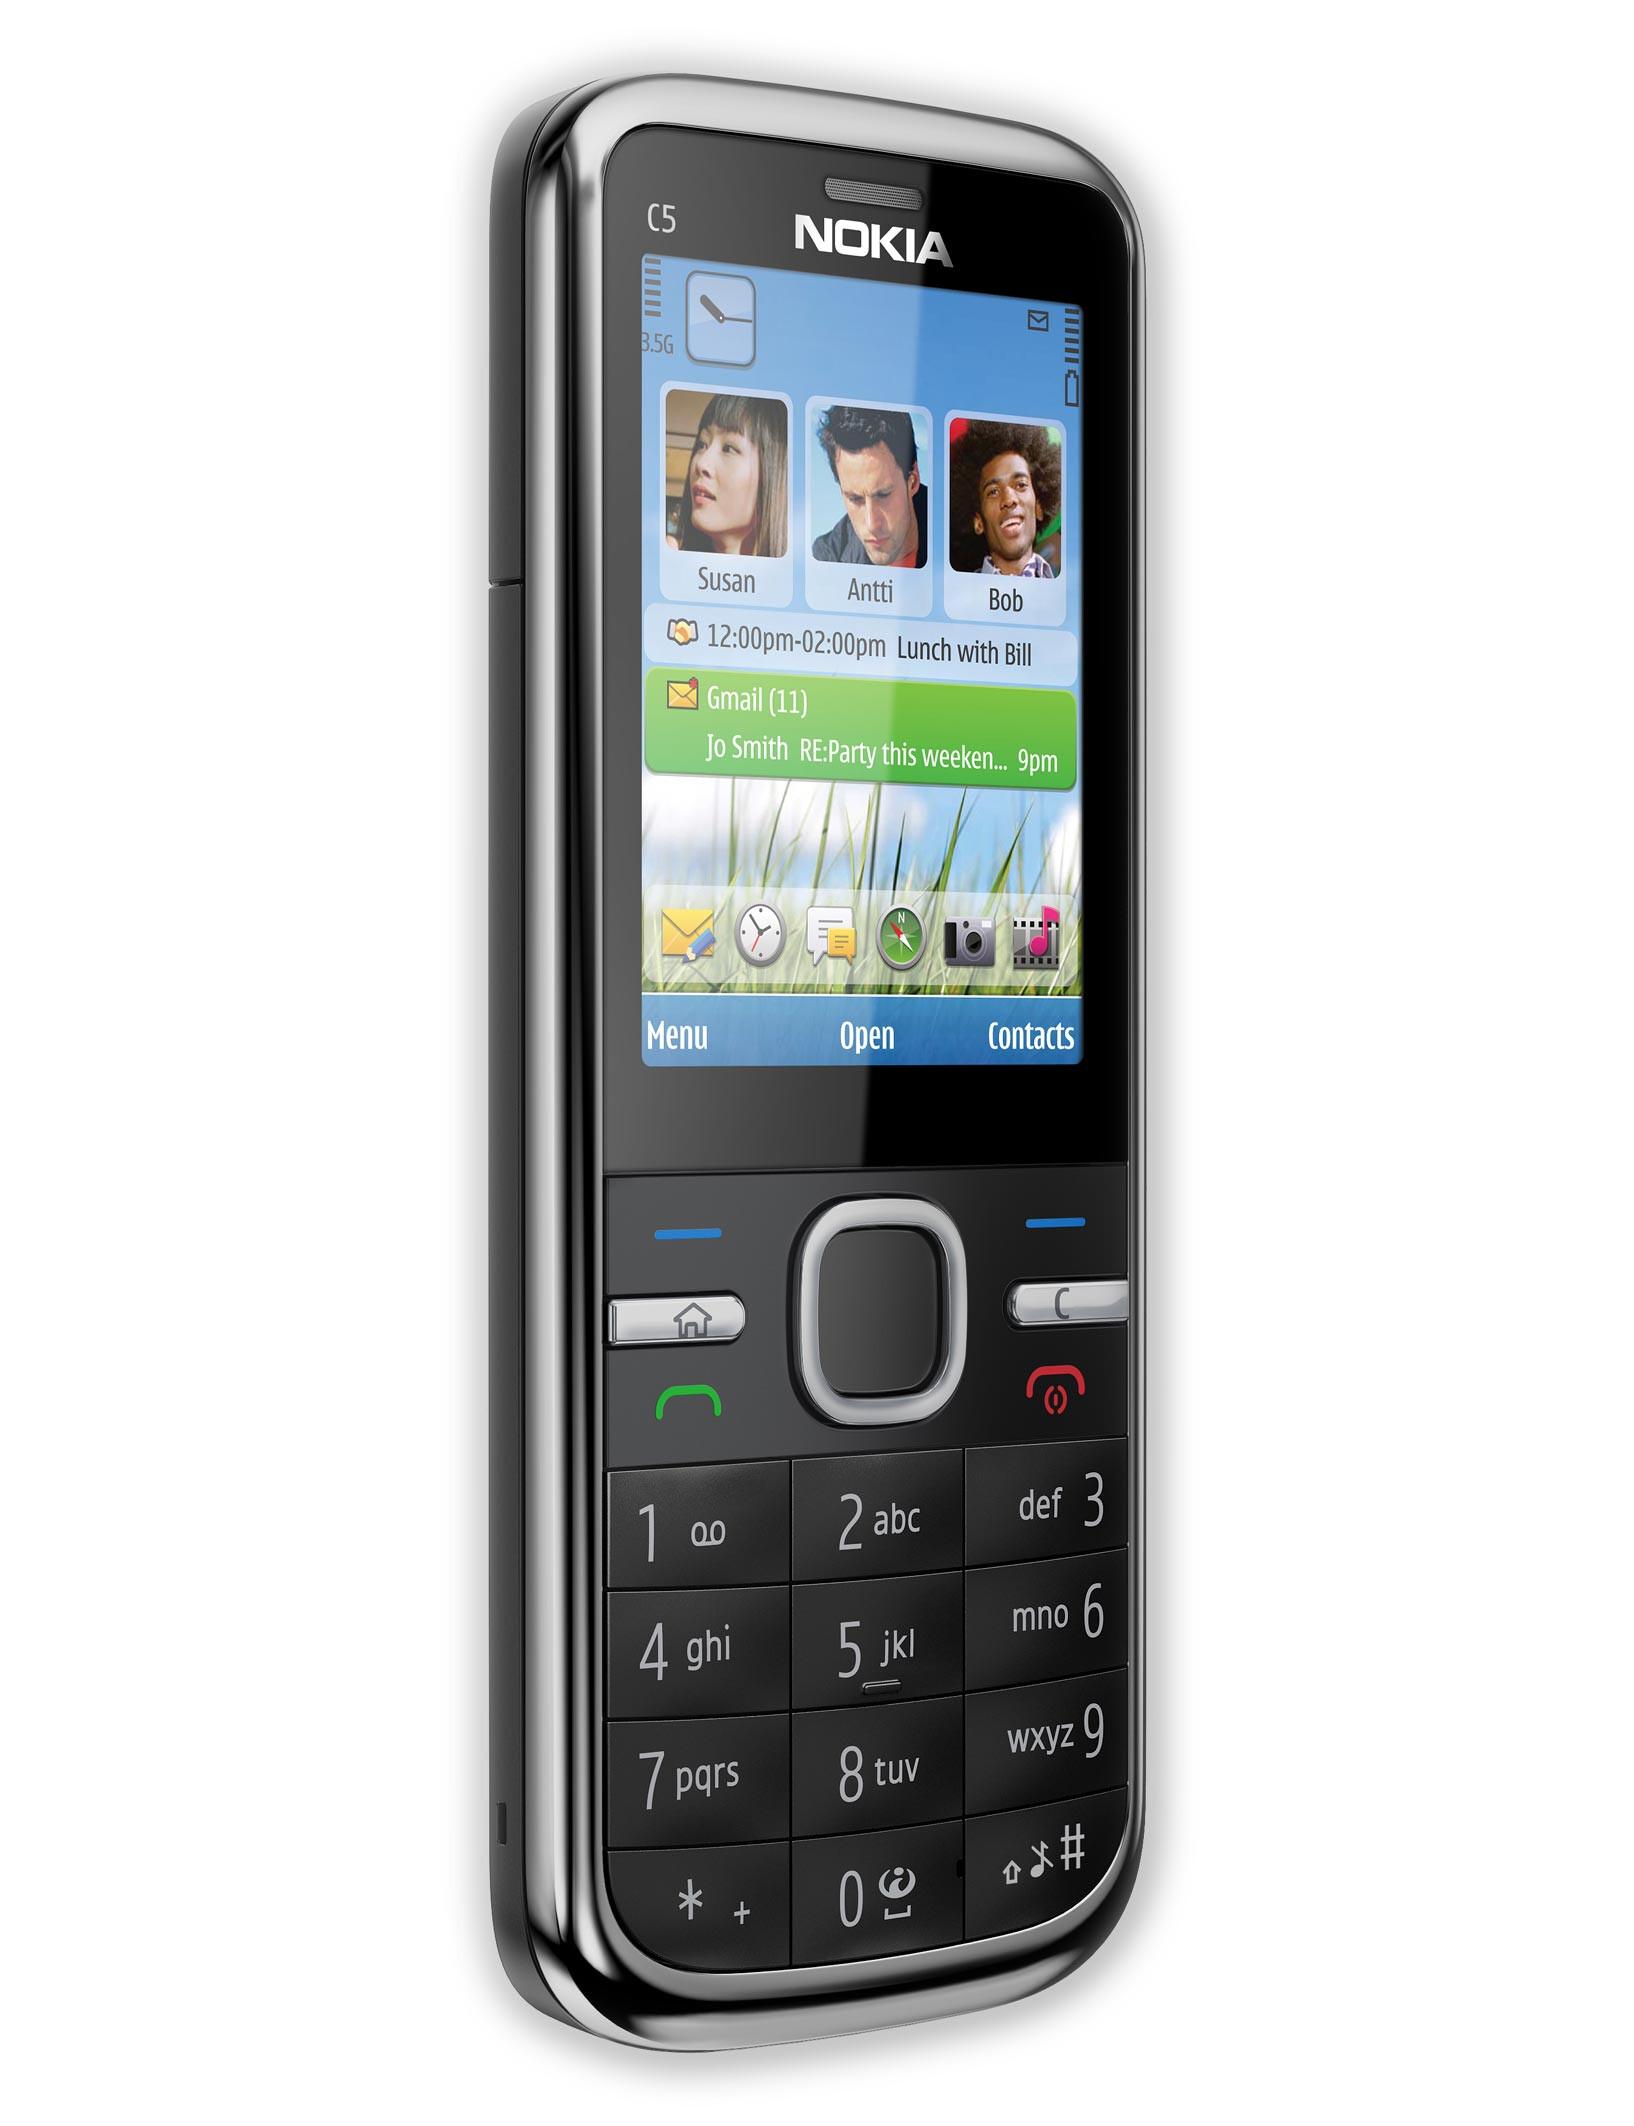 Nokia C5 5mp Specs